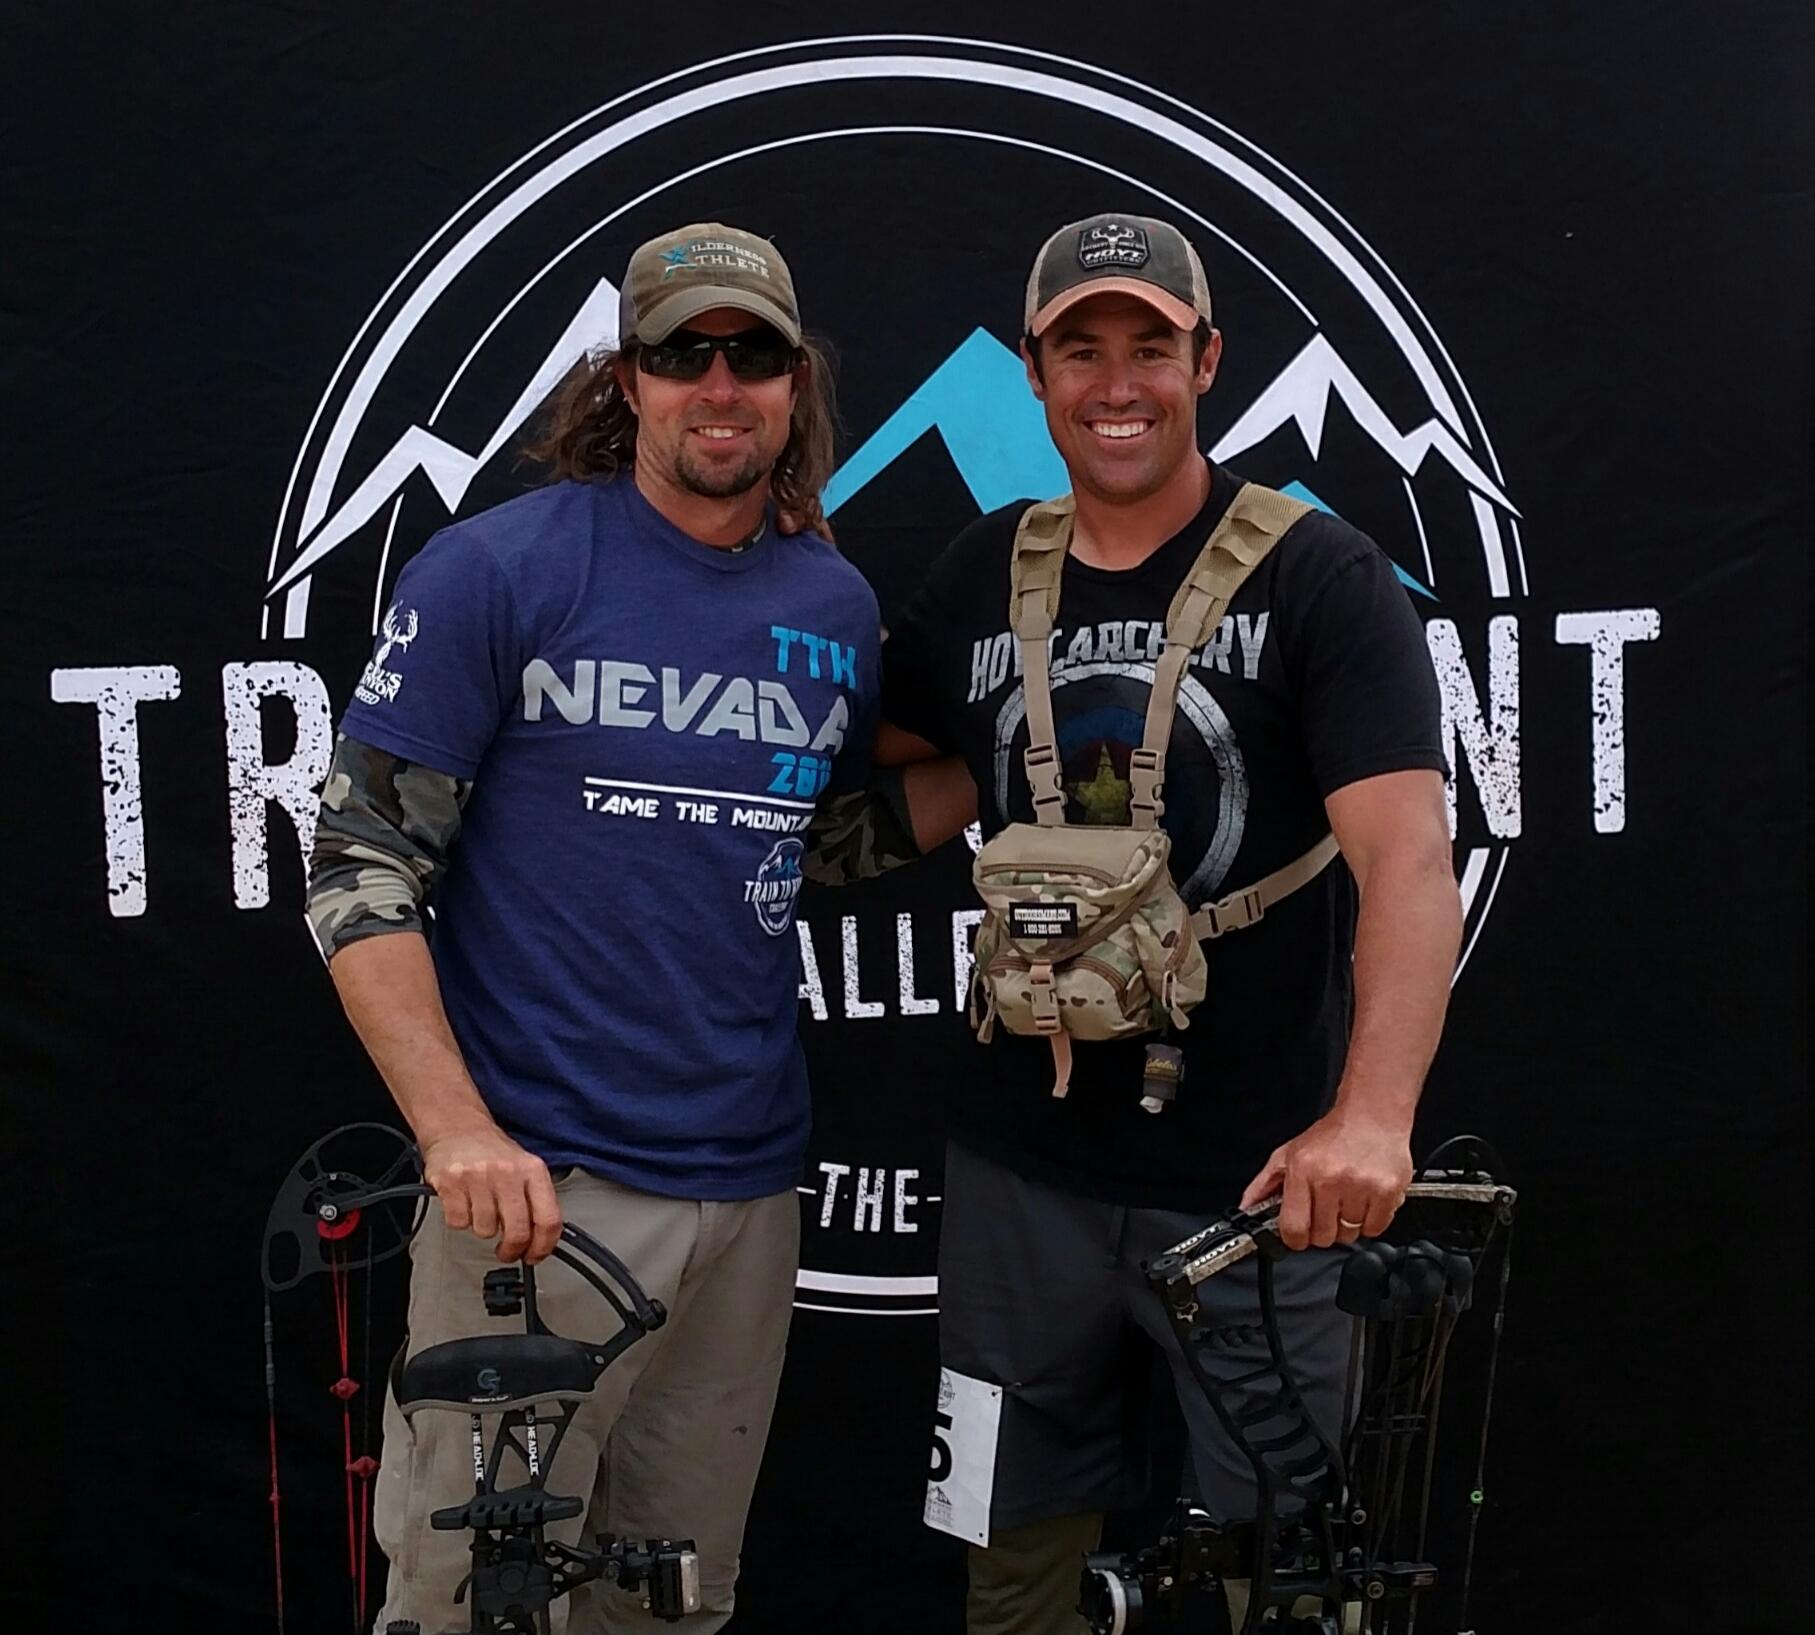 Ryan and Dave TTH Nevada 2016